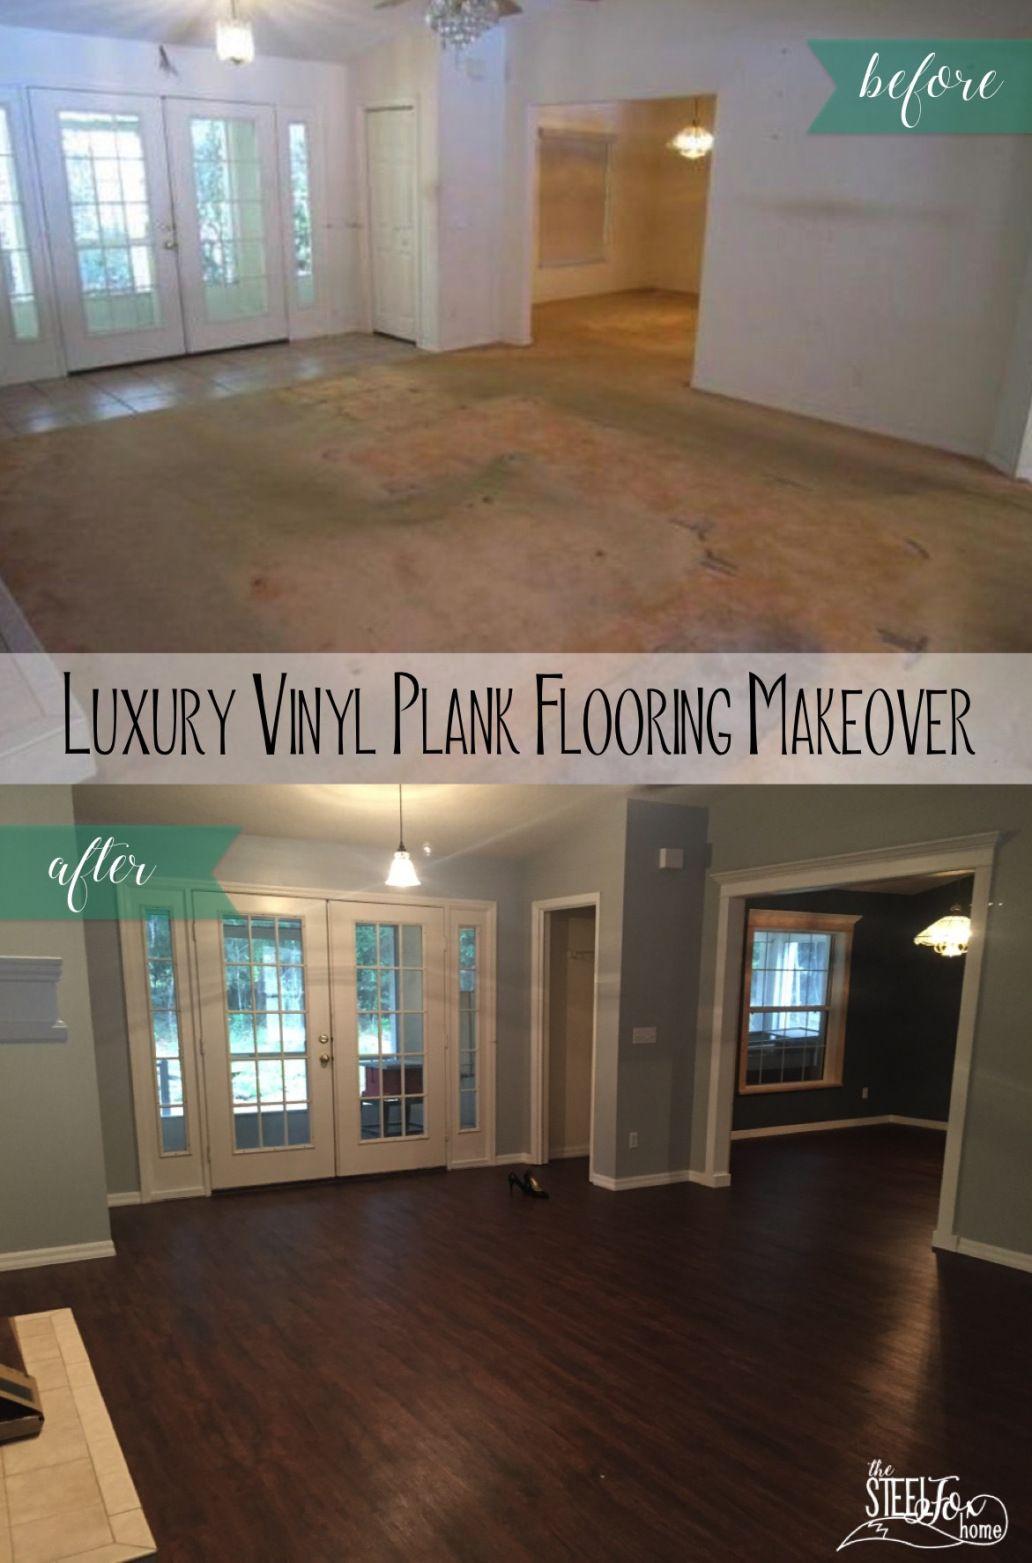 20 Before And After Livng Room2 Luxury Vinyl Plank Luxury Vinyl